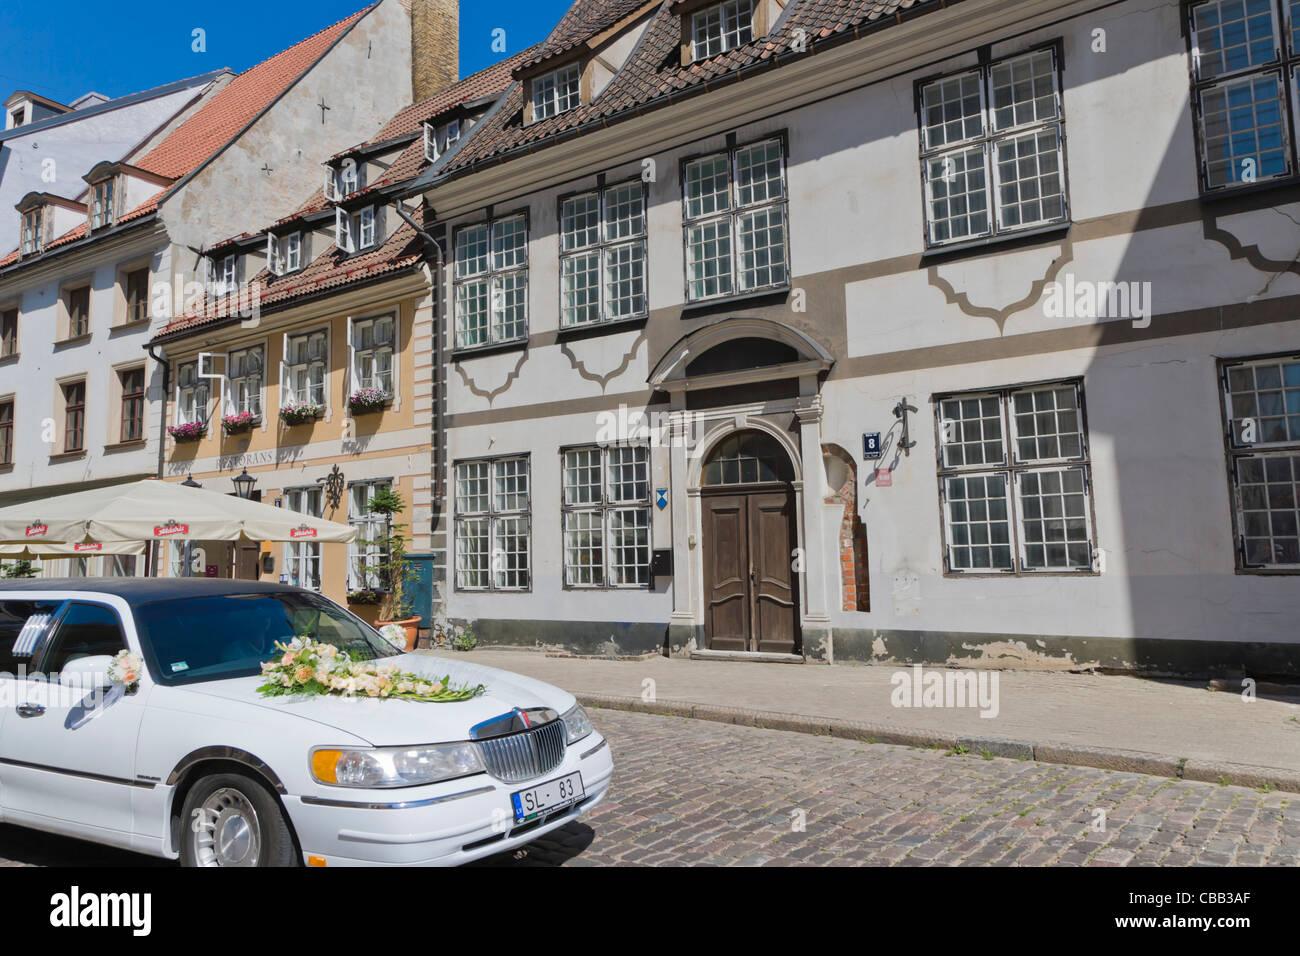 Skarnu iela, Skarnu Street, Old Town, Vecriga, Riga, Latvia - Stock Image